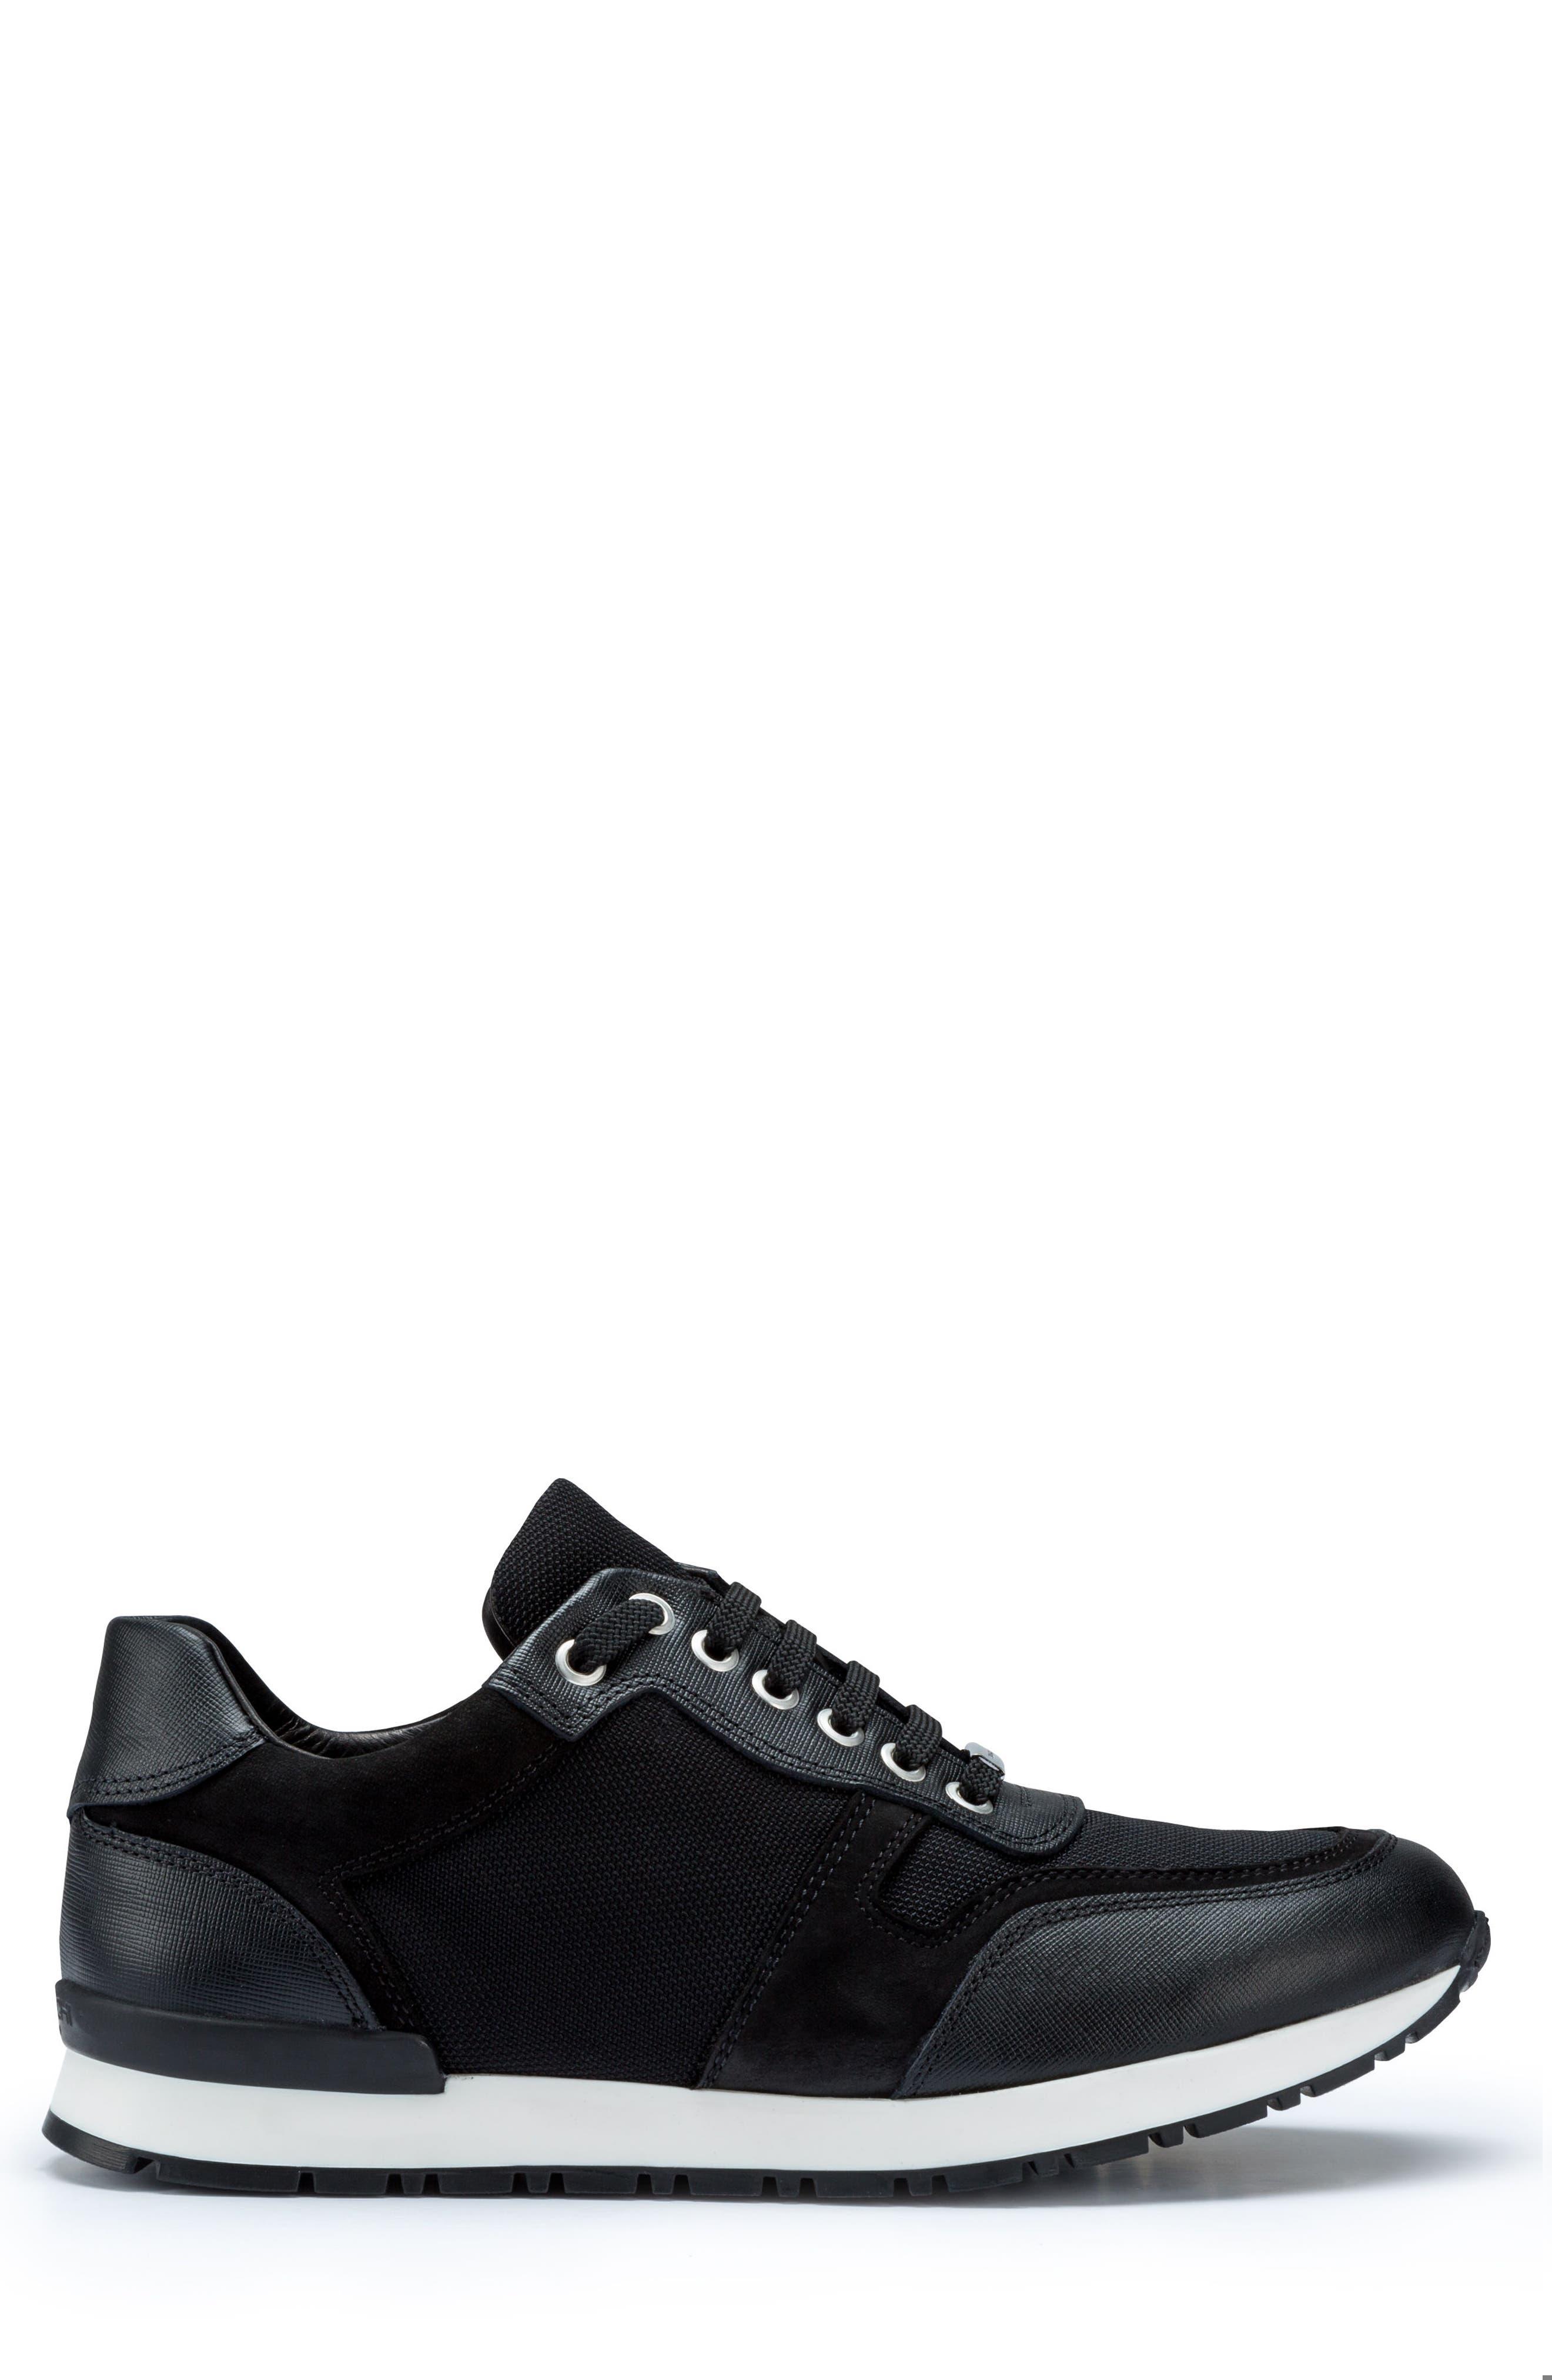 Modena Sneaker,                             Alternate thumbnail 3, color,                             001